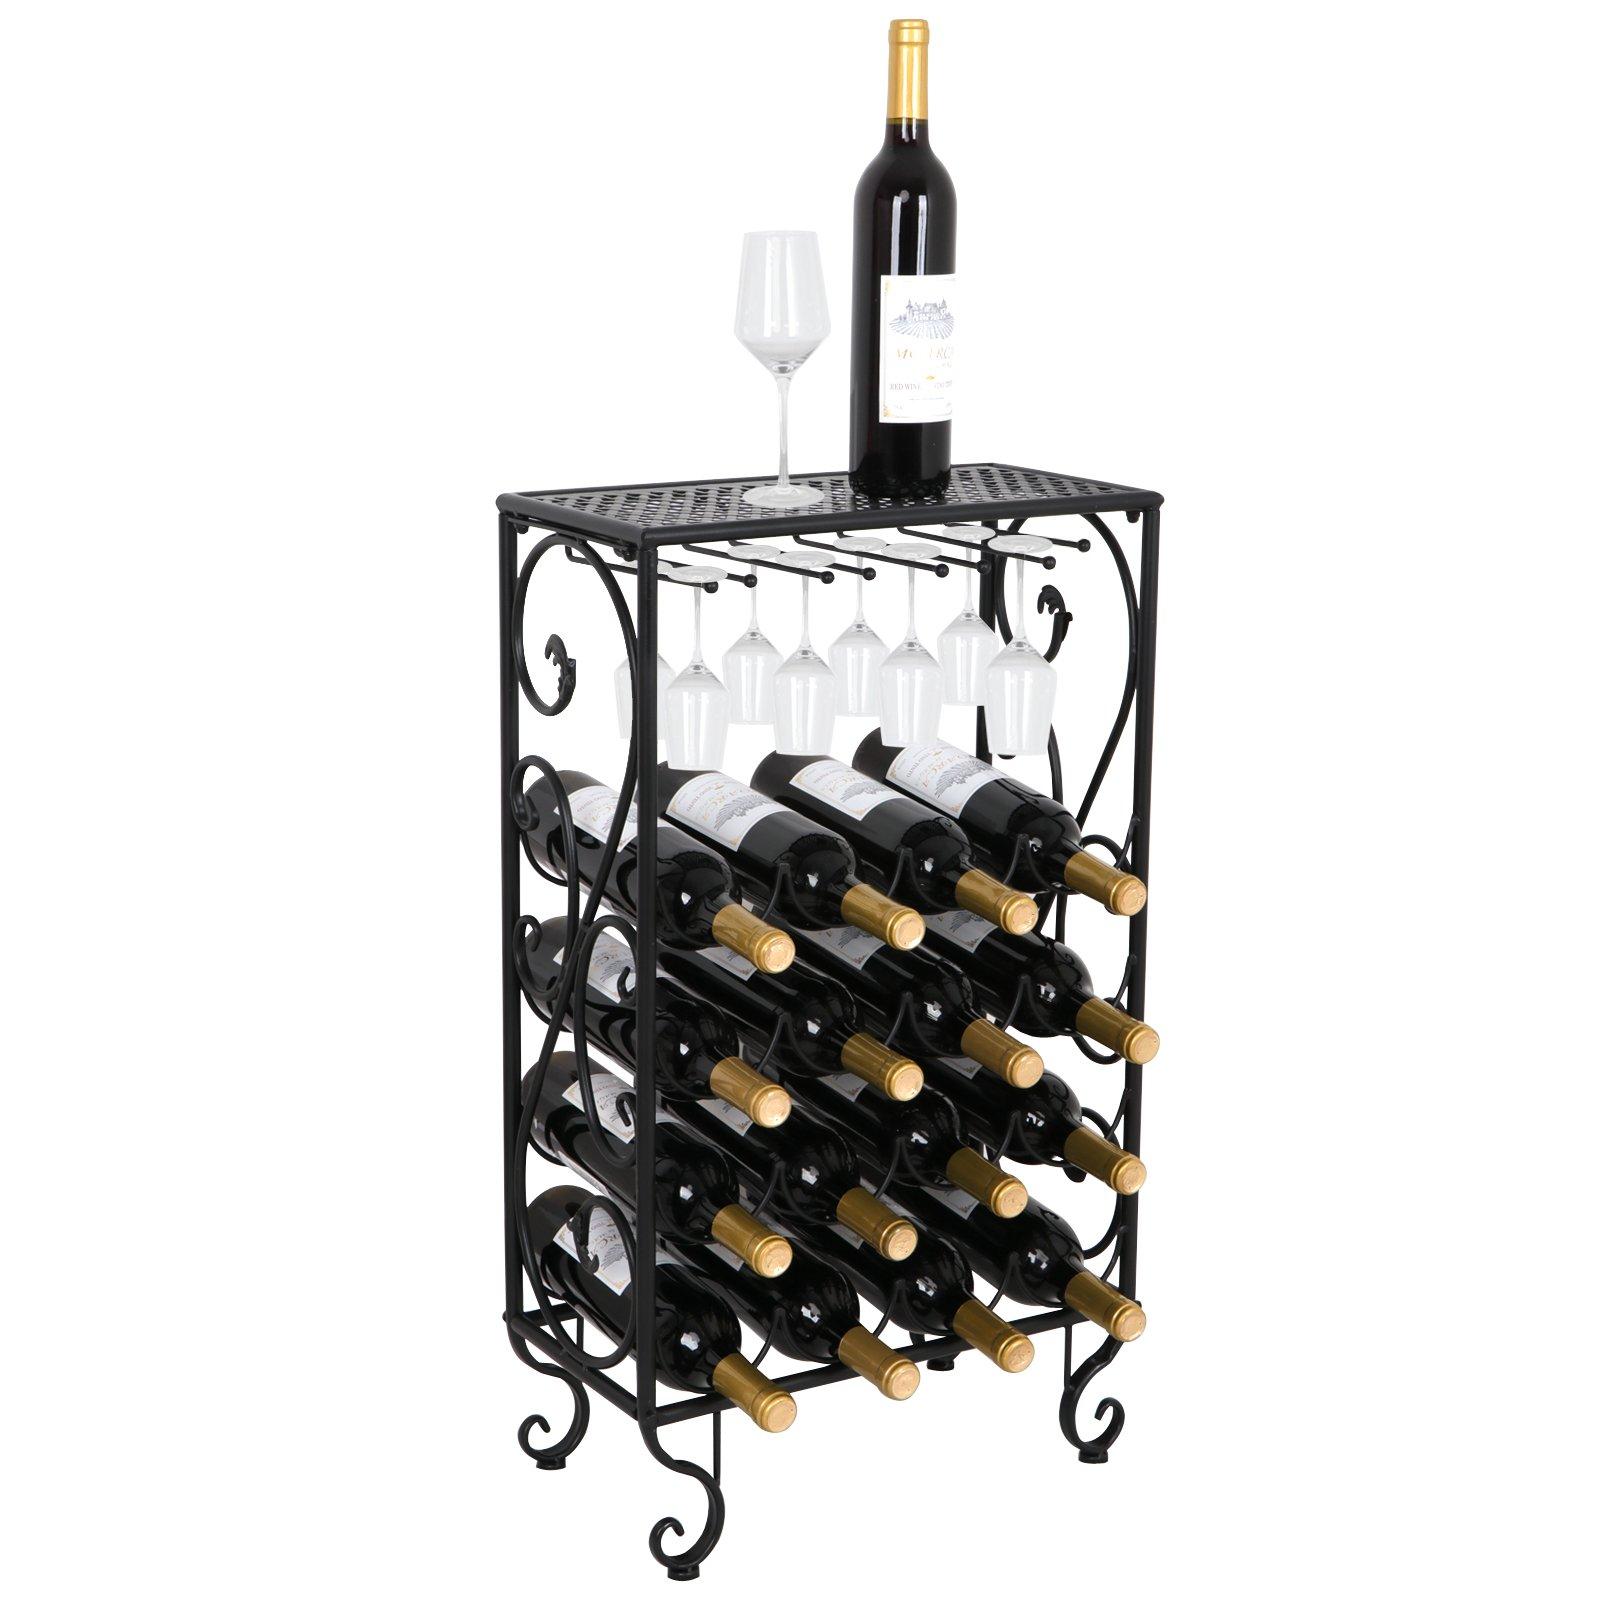 ZENY 16 Bottle Wine Storage Rack,Wine Bottle Holder Origanizer Display Rack Free Standing w/Glass Holder and Counter Top,Steel